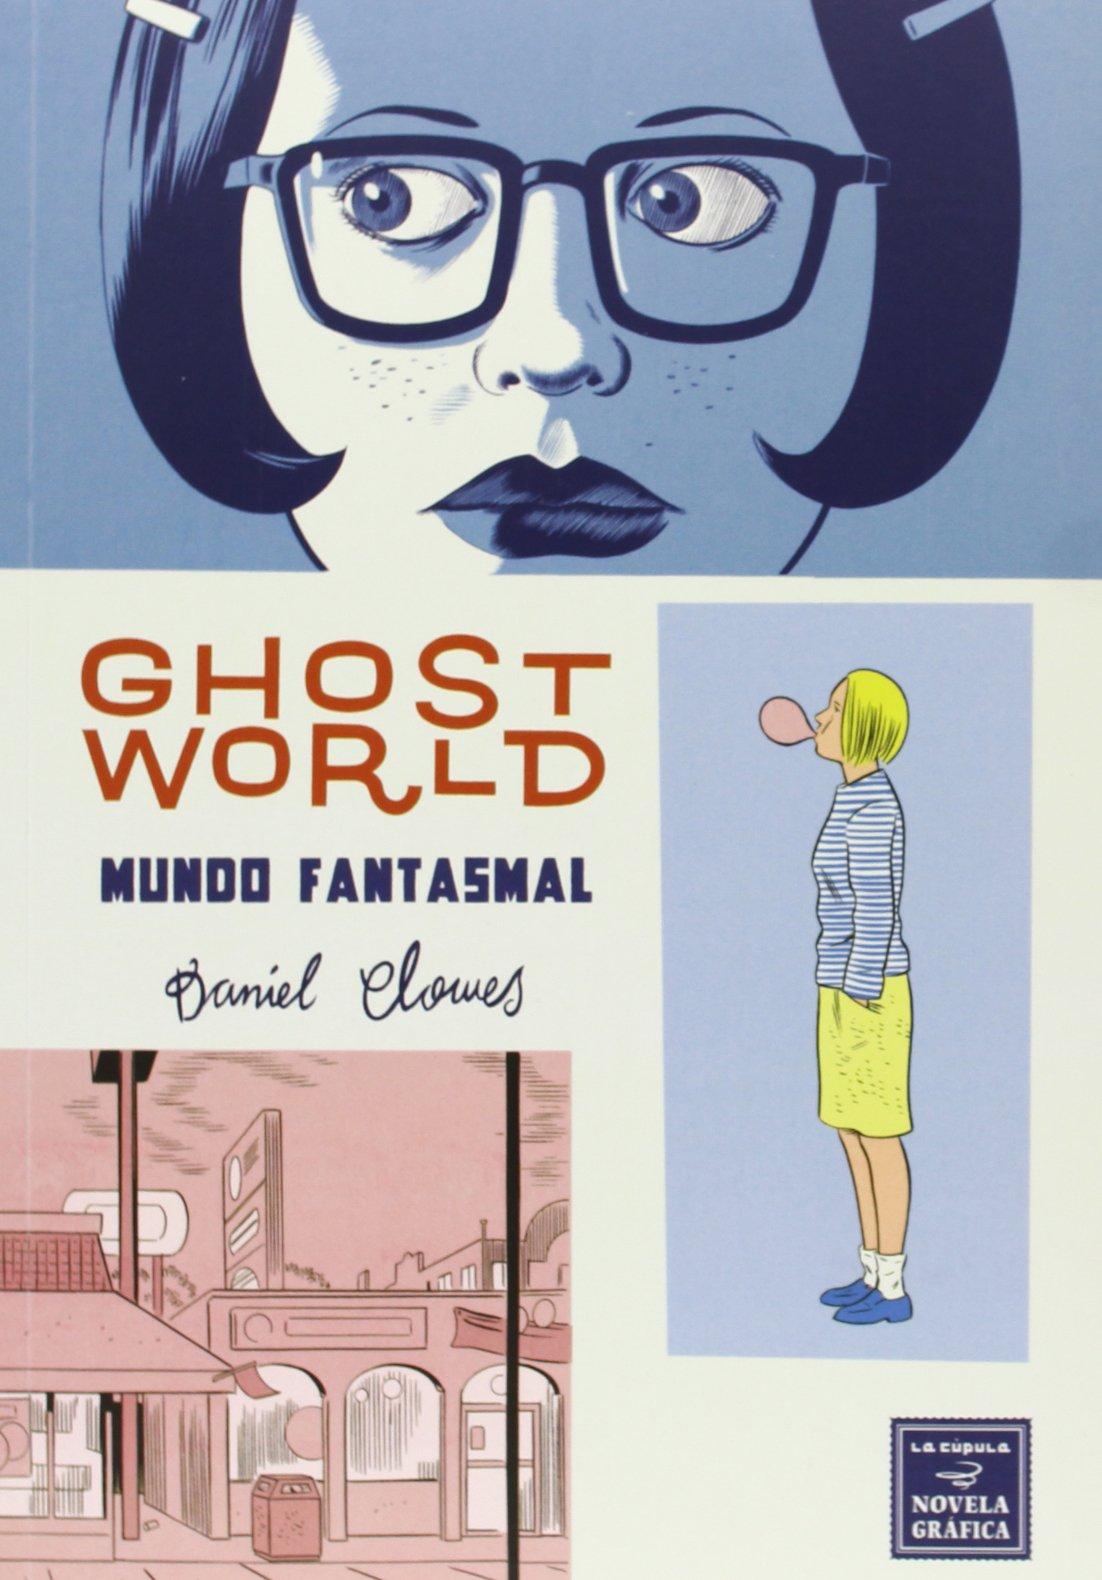 Ghost World. Mundo Fantasmal - 9ª Edición (Novela gráfica) Tapa blanda – 22 oct 2013 Daniel Clowes Lorenzo Díaz Buendía La Cúpula 8415724438